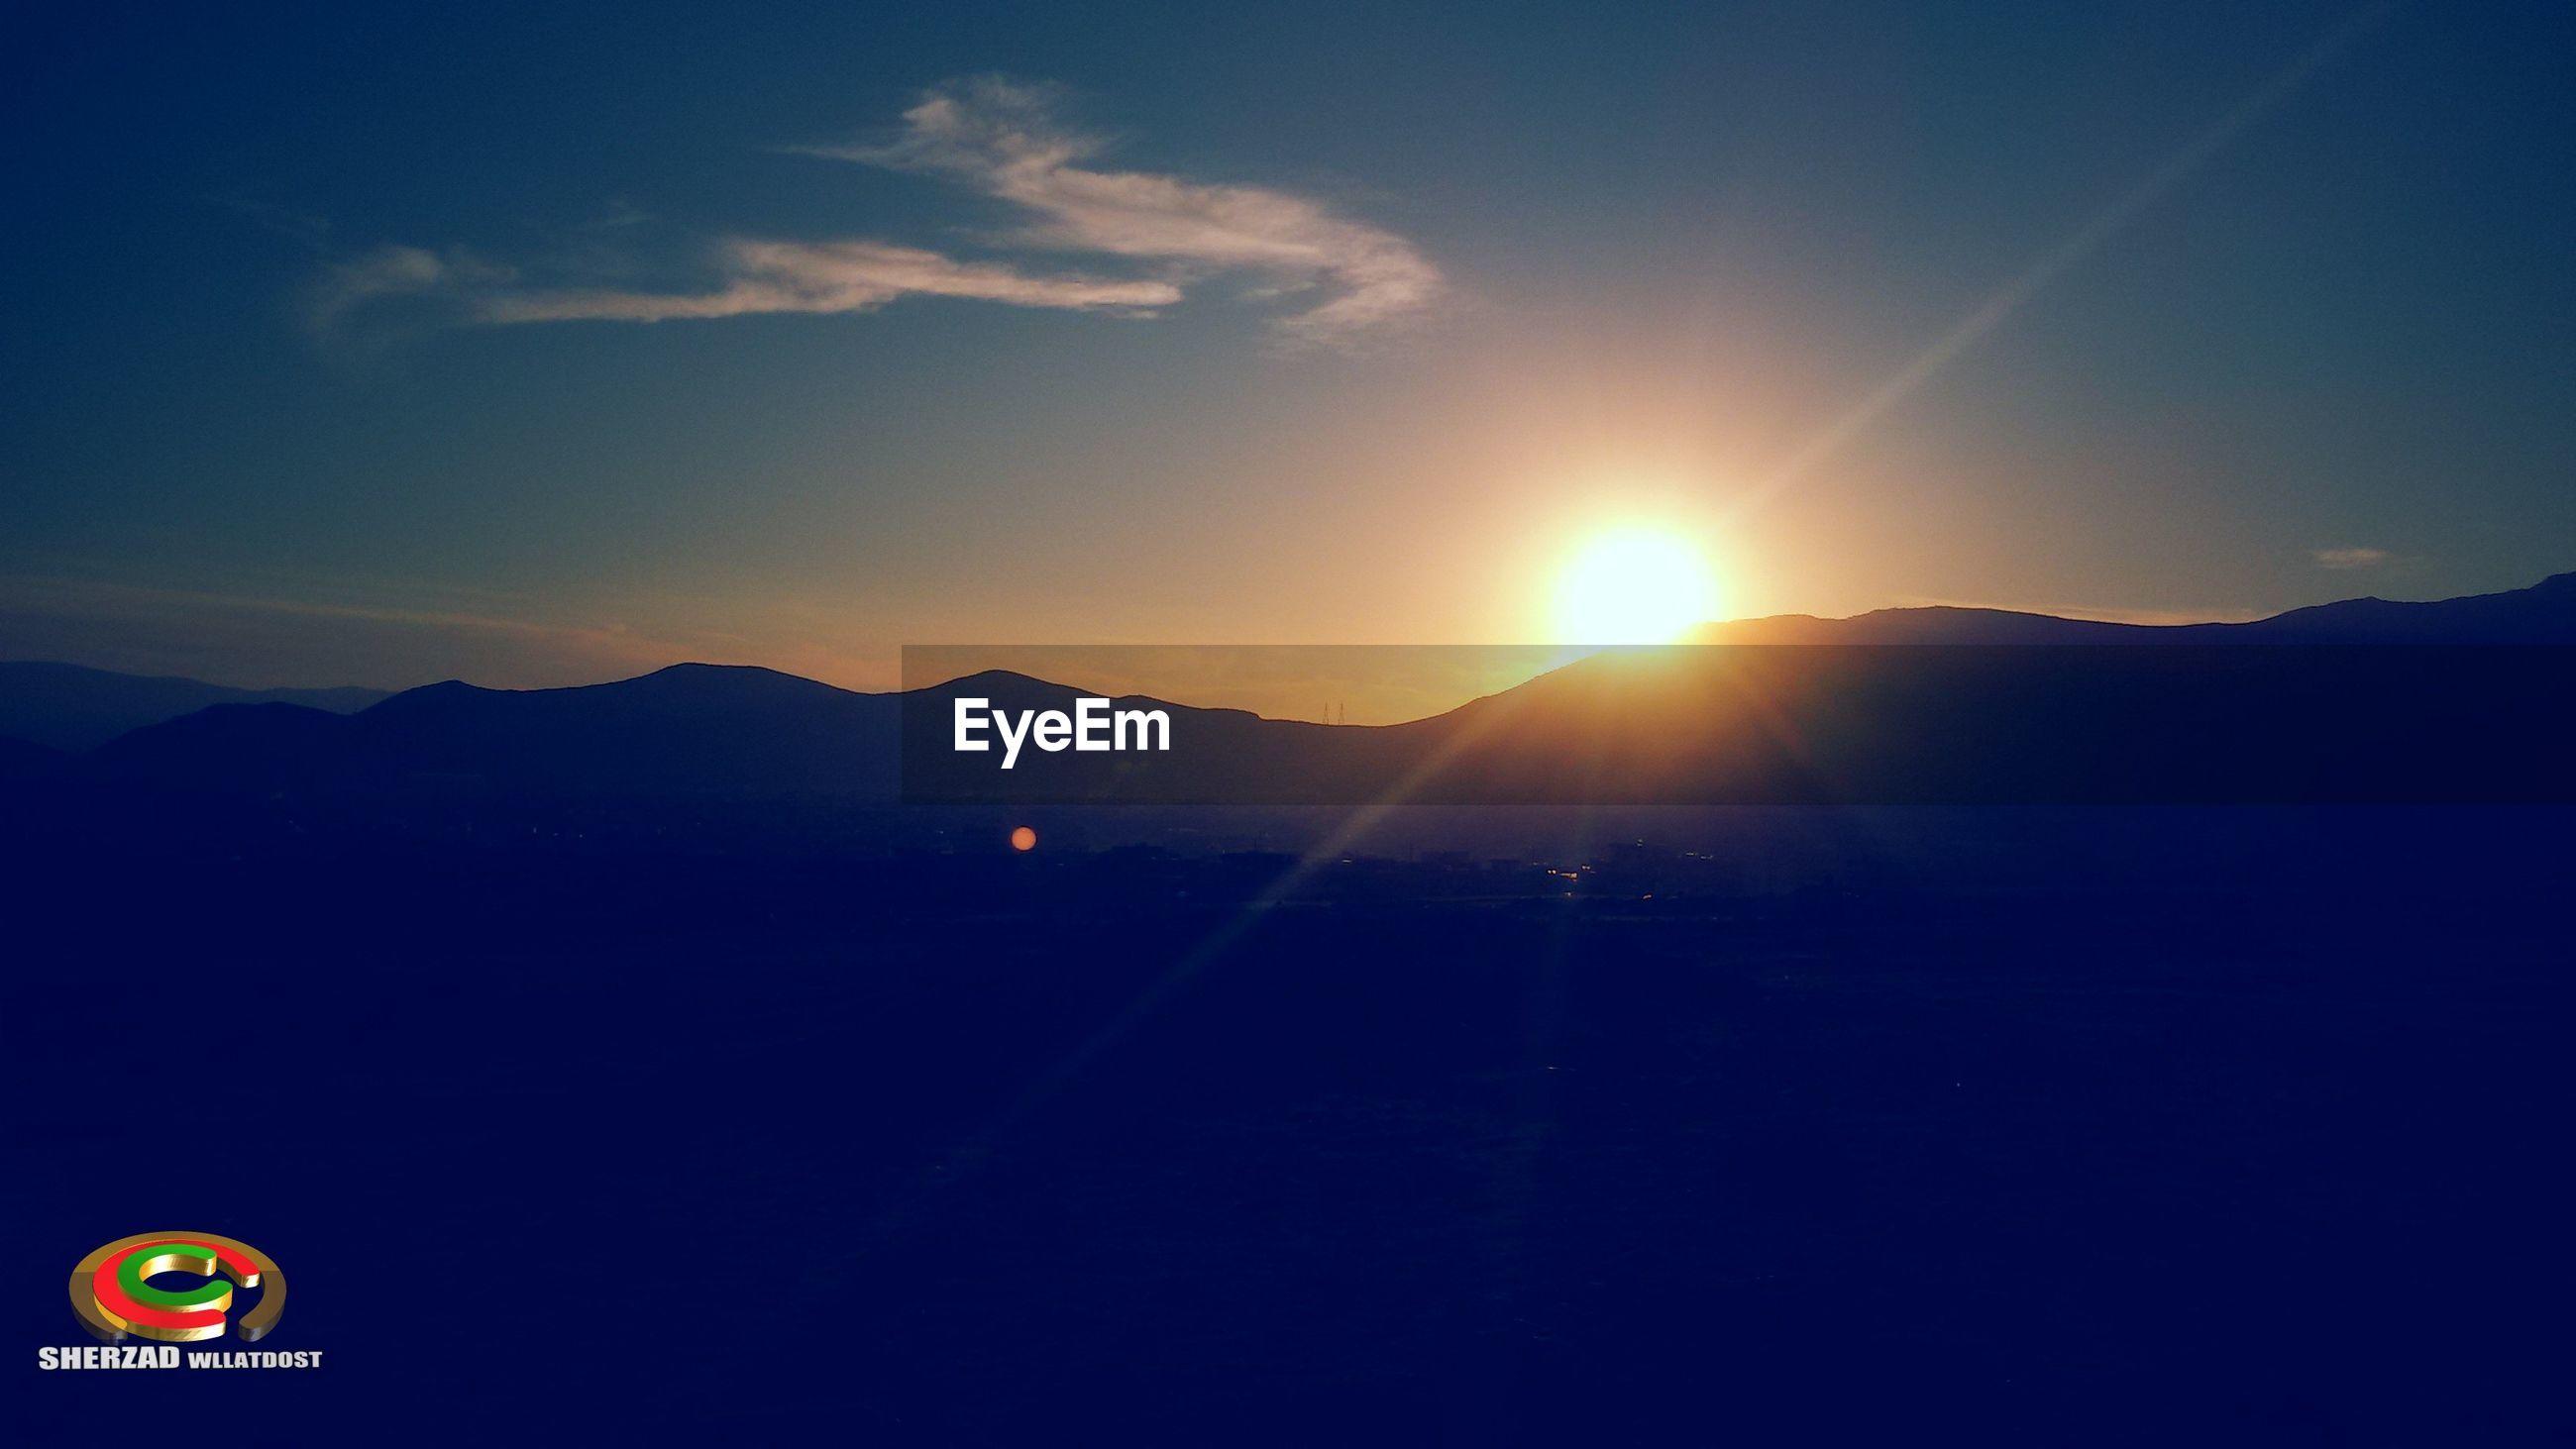 sunset, mountain, sun, scenics, beauty in nature, silhouette, sky, mountain range, tranquil scene, tranquility, nature, sunlight, orange color, idyllic, lens flare, landscape, outdoors, sunbeam, copy space, transportation